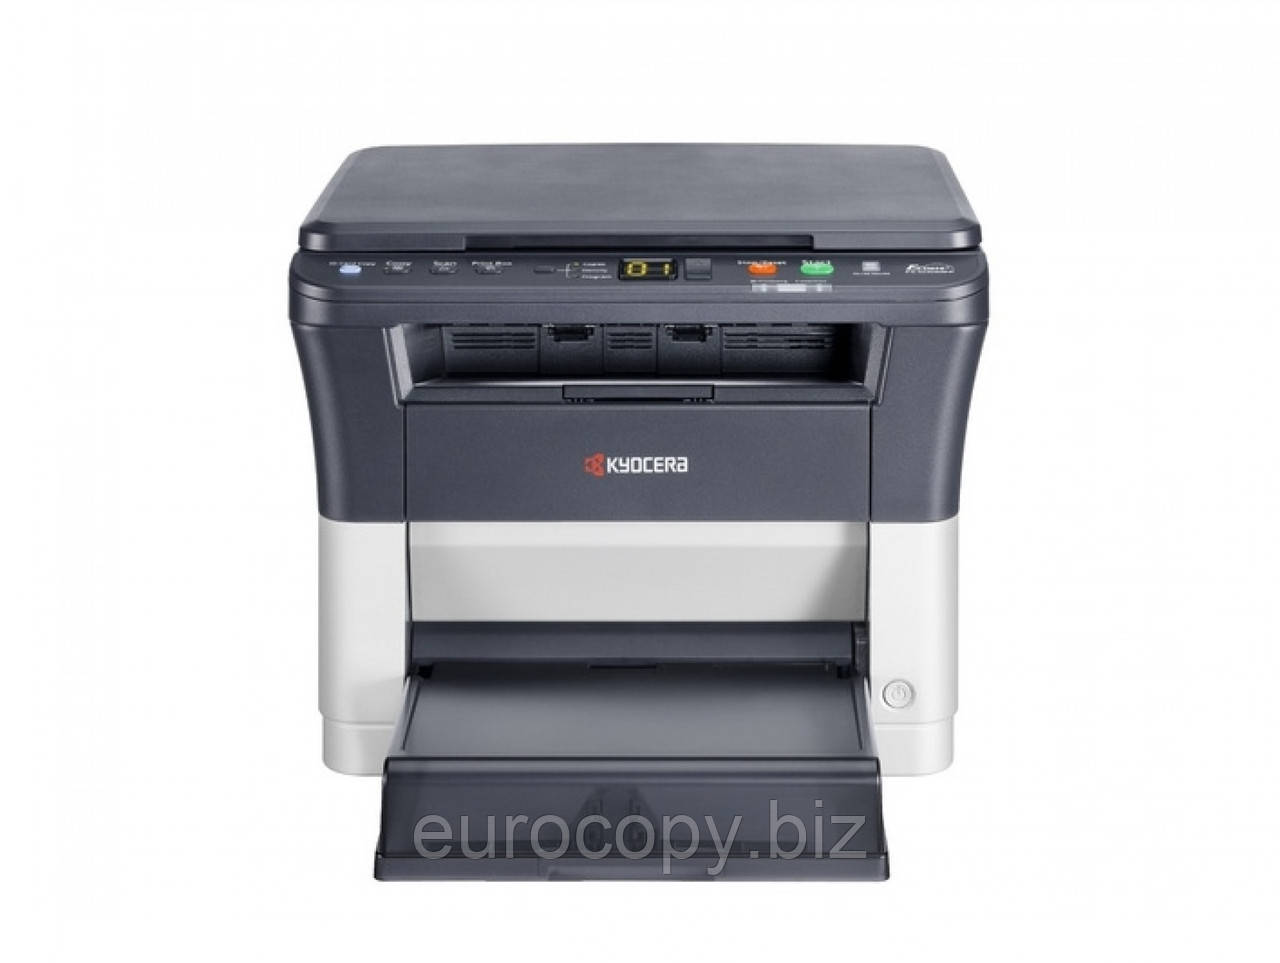 БФП Kyocera ECOSYS FS-1020MFP А4 (1102M43RU2)